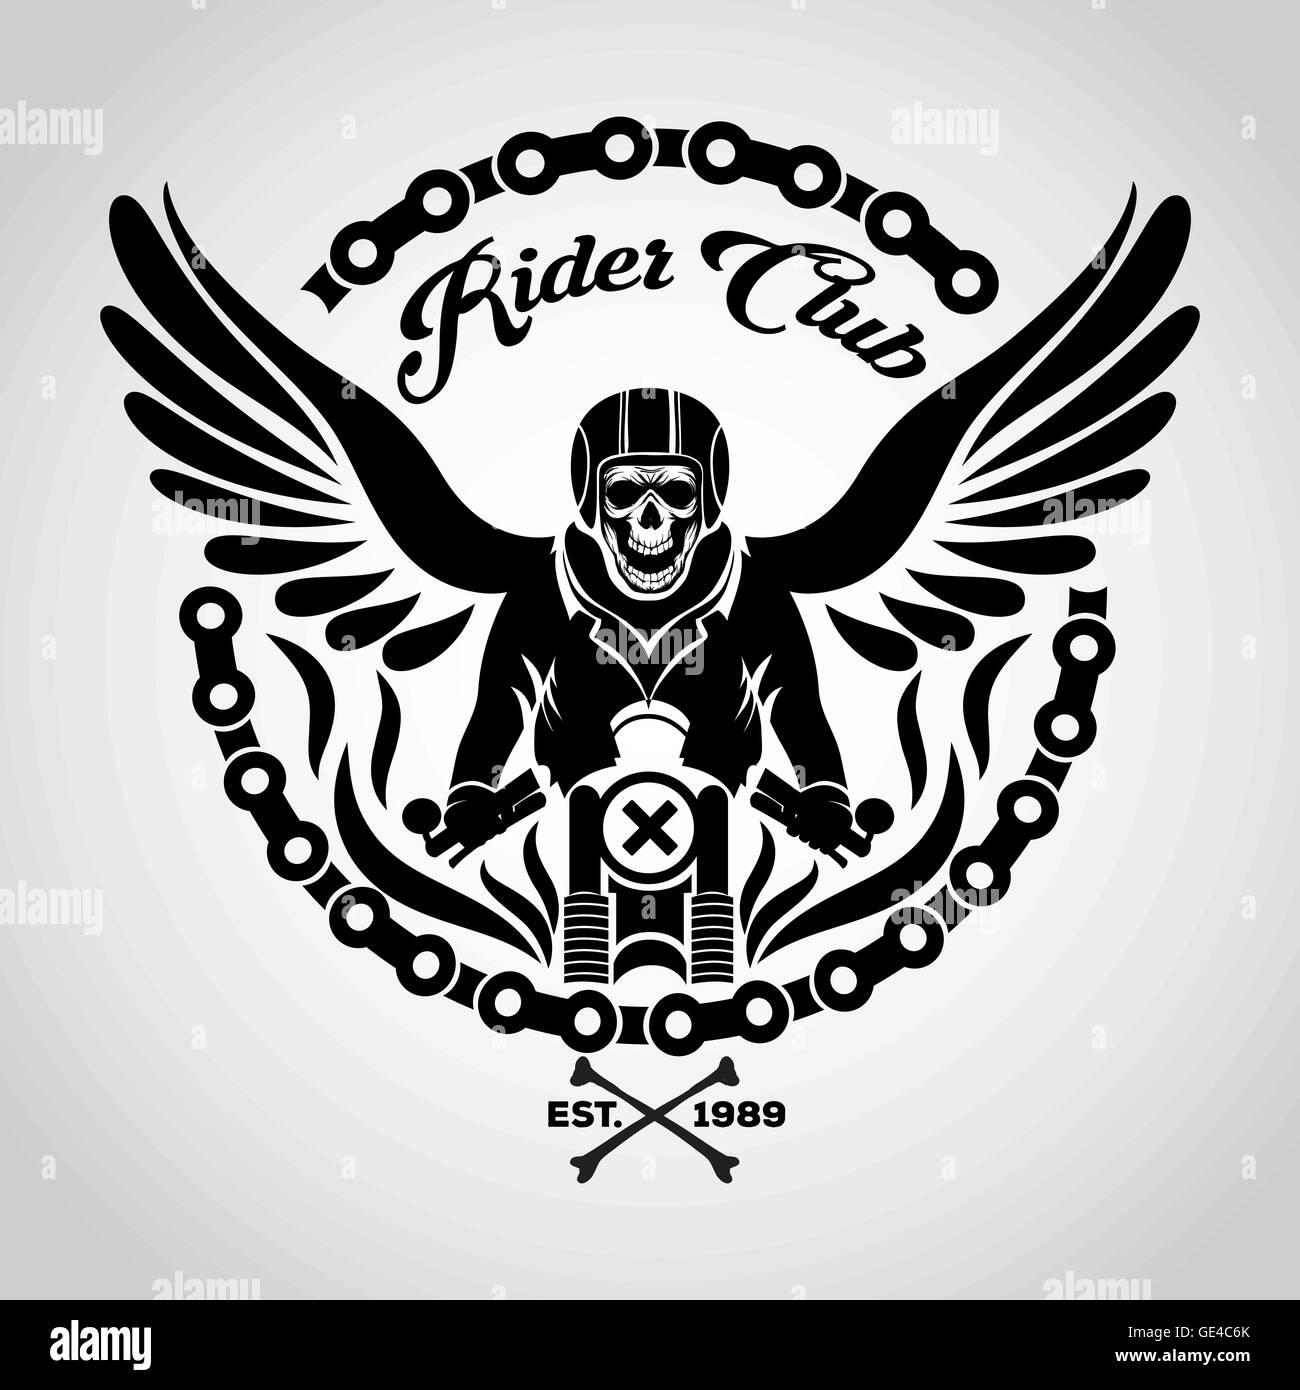 bikers skull logo - photo #1